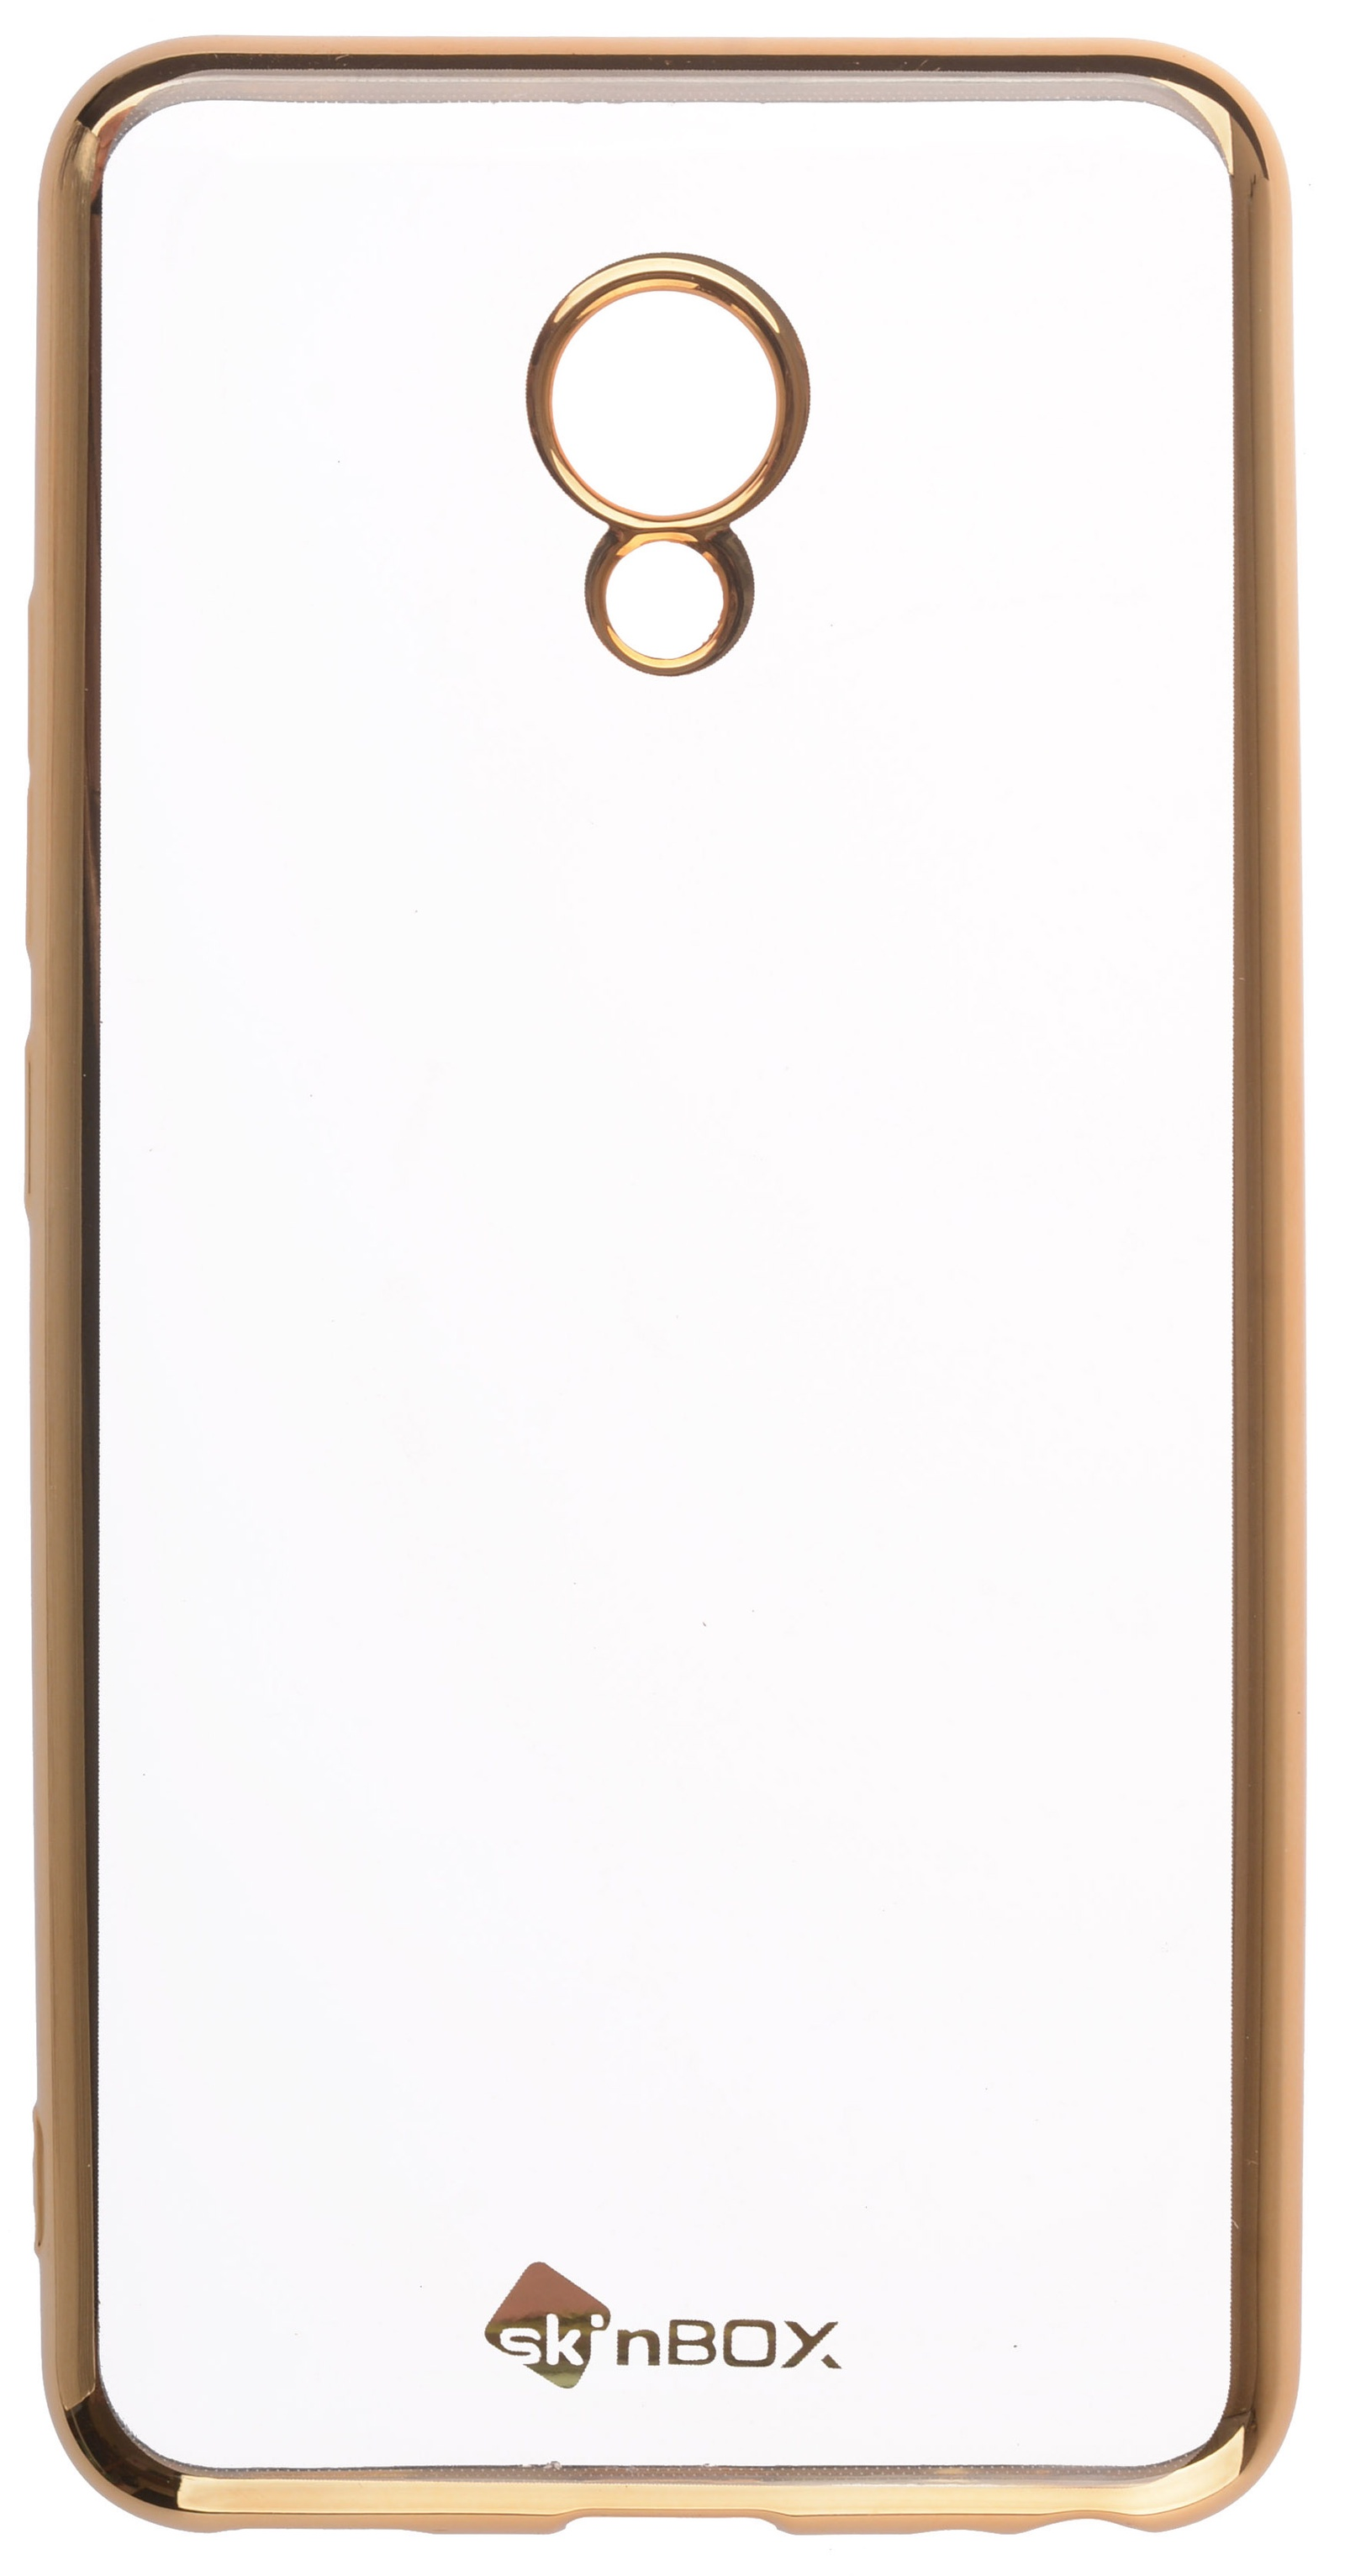 все цены на Чехол для сотового телефона skinBOX Silicone chrome border, 4630042529502, золотой онлайн